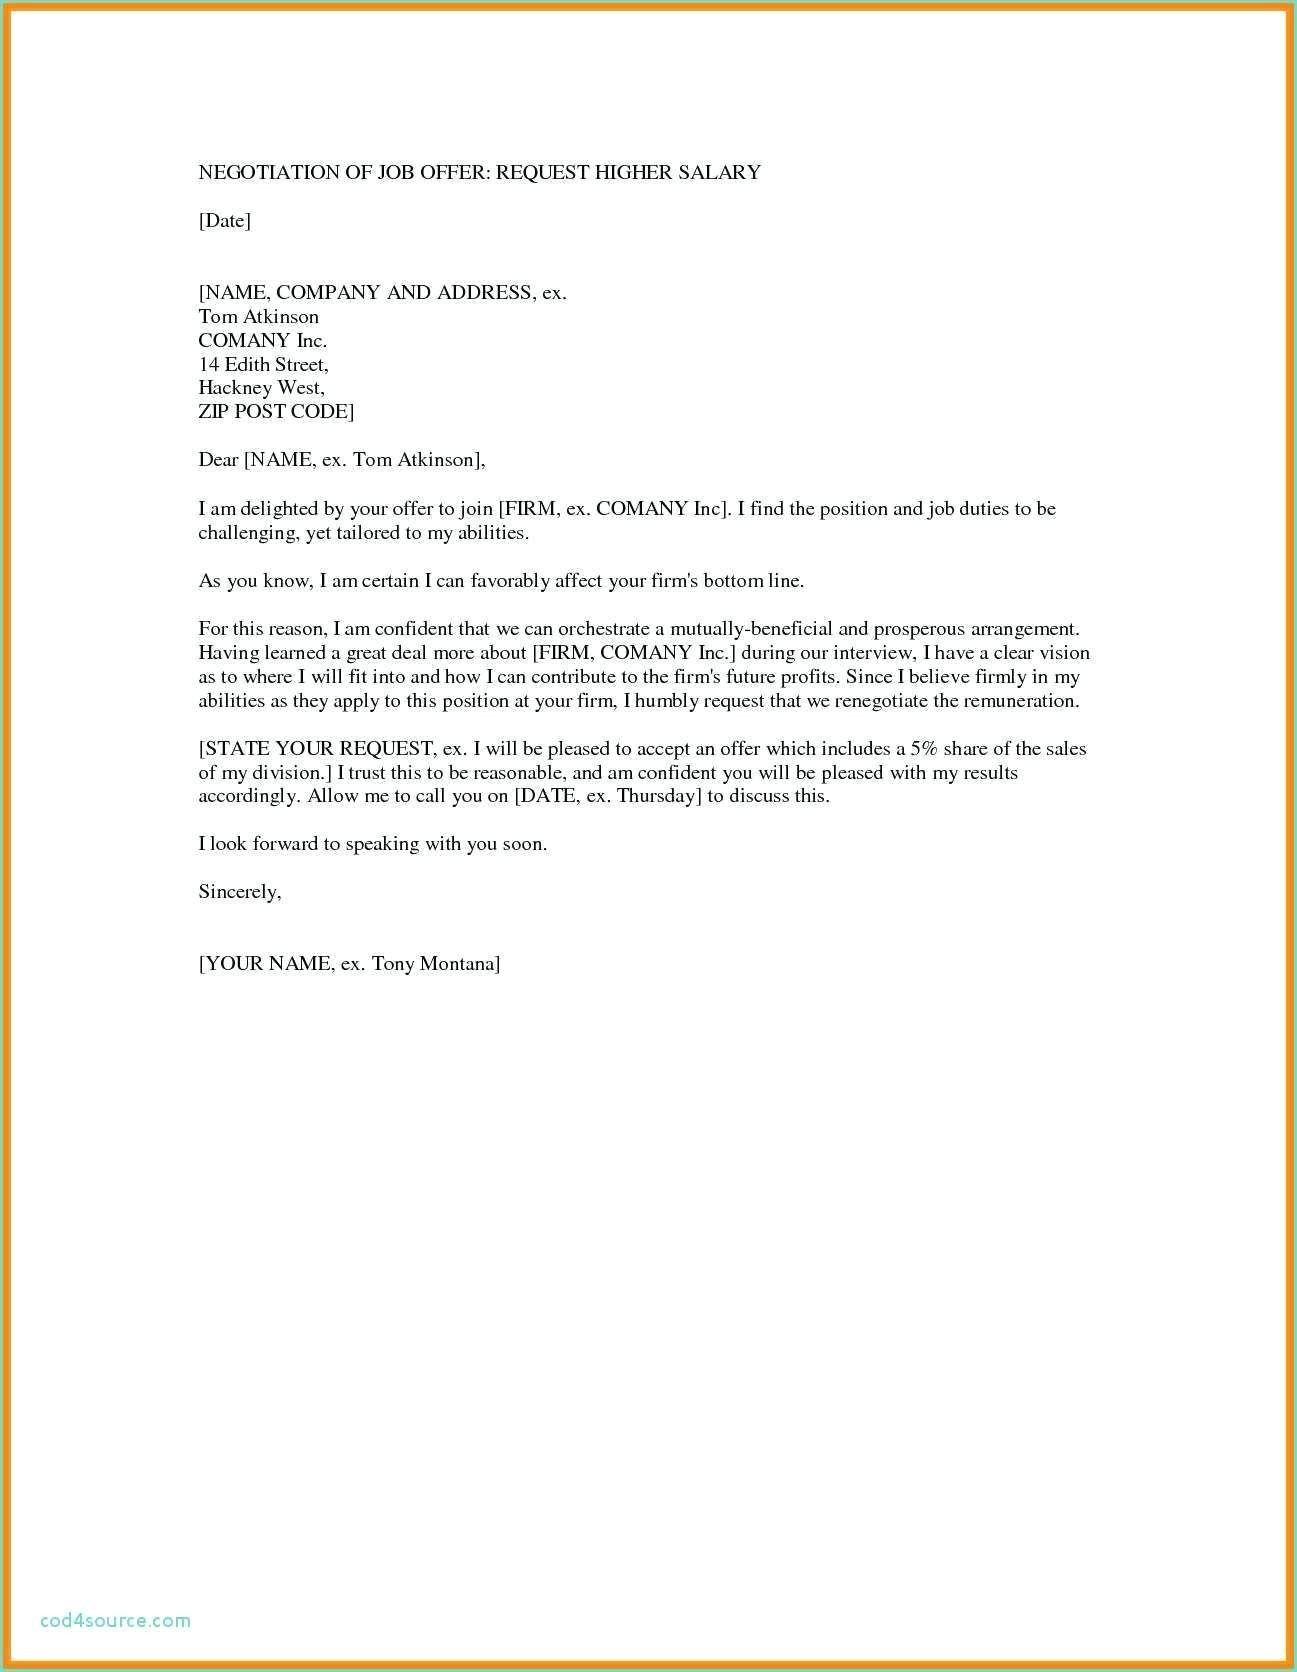 Fresh Negotiating Job Offer Sample Letter (With images